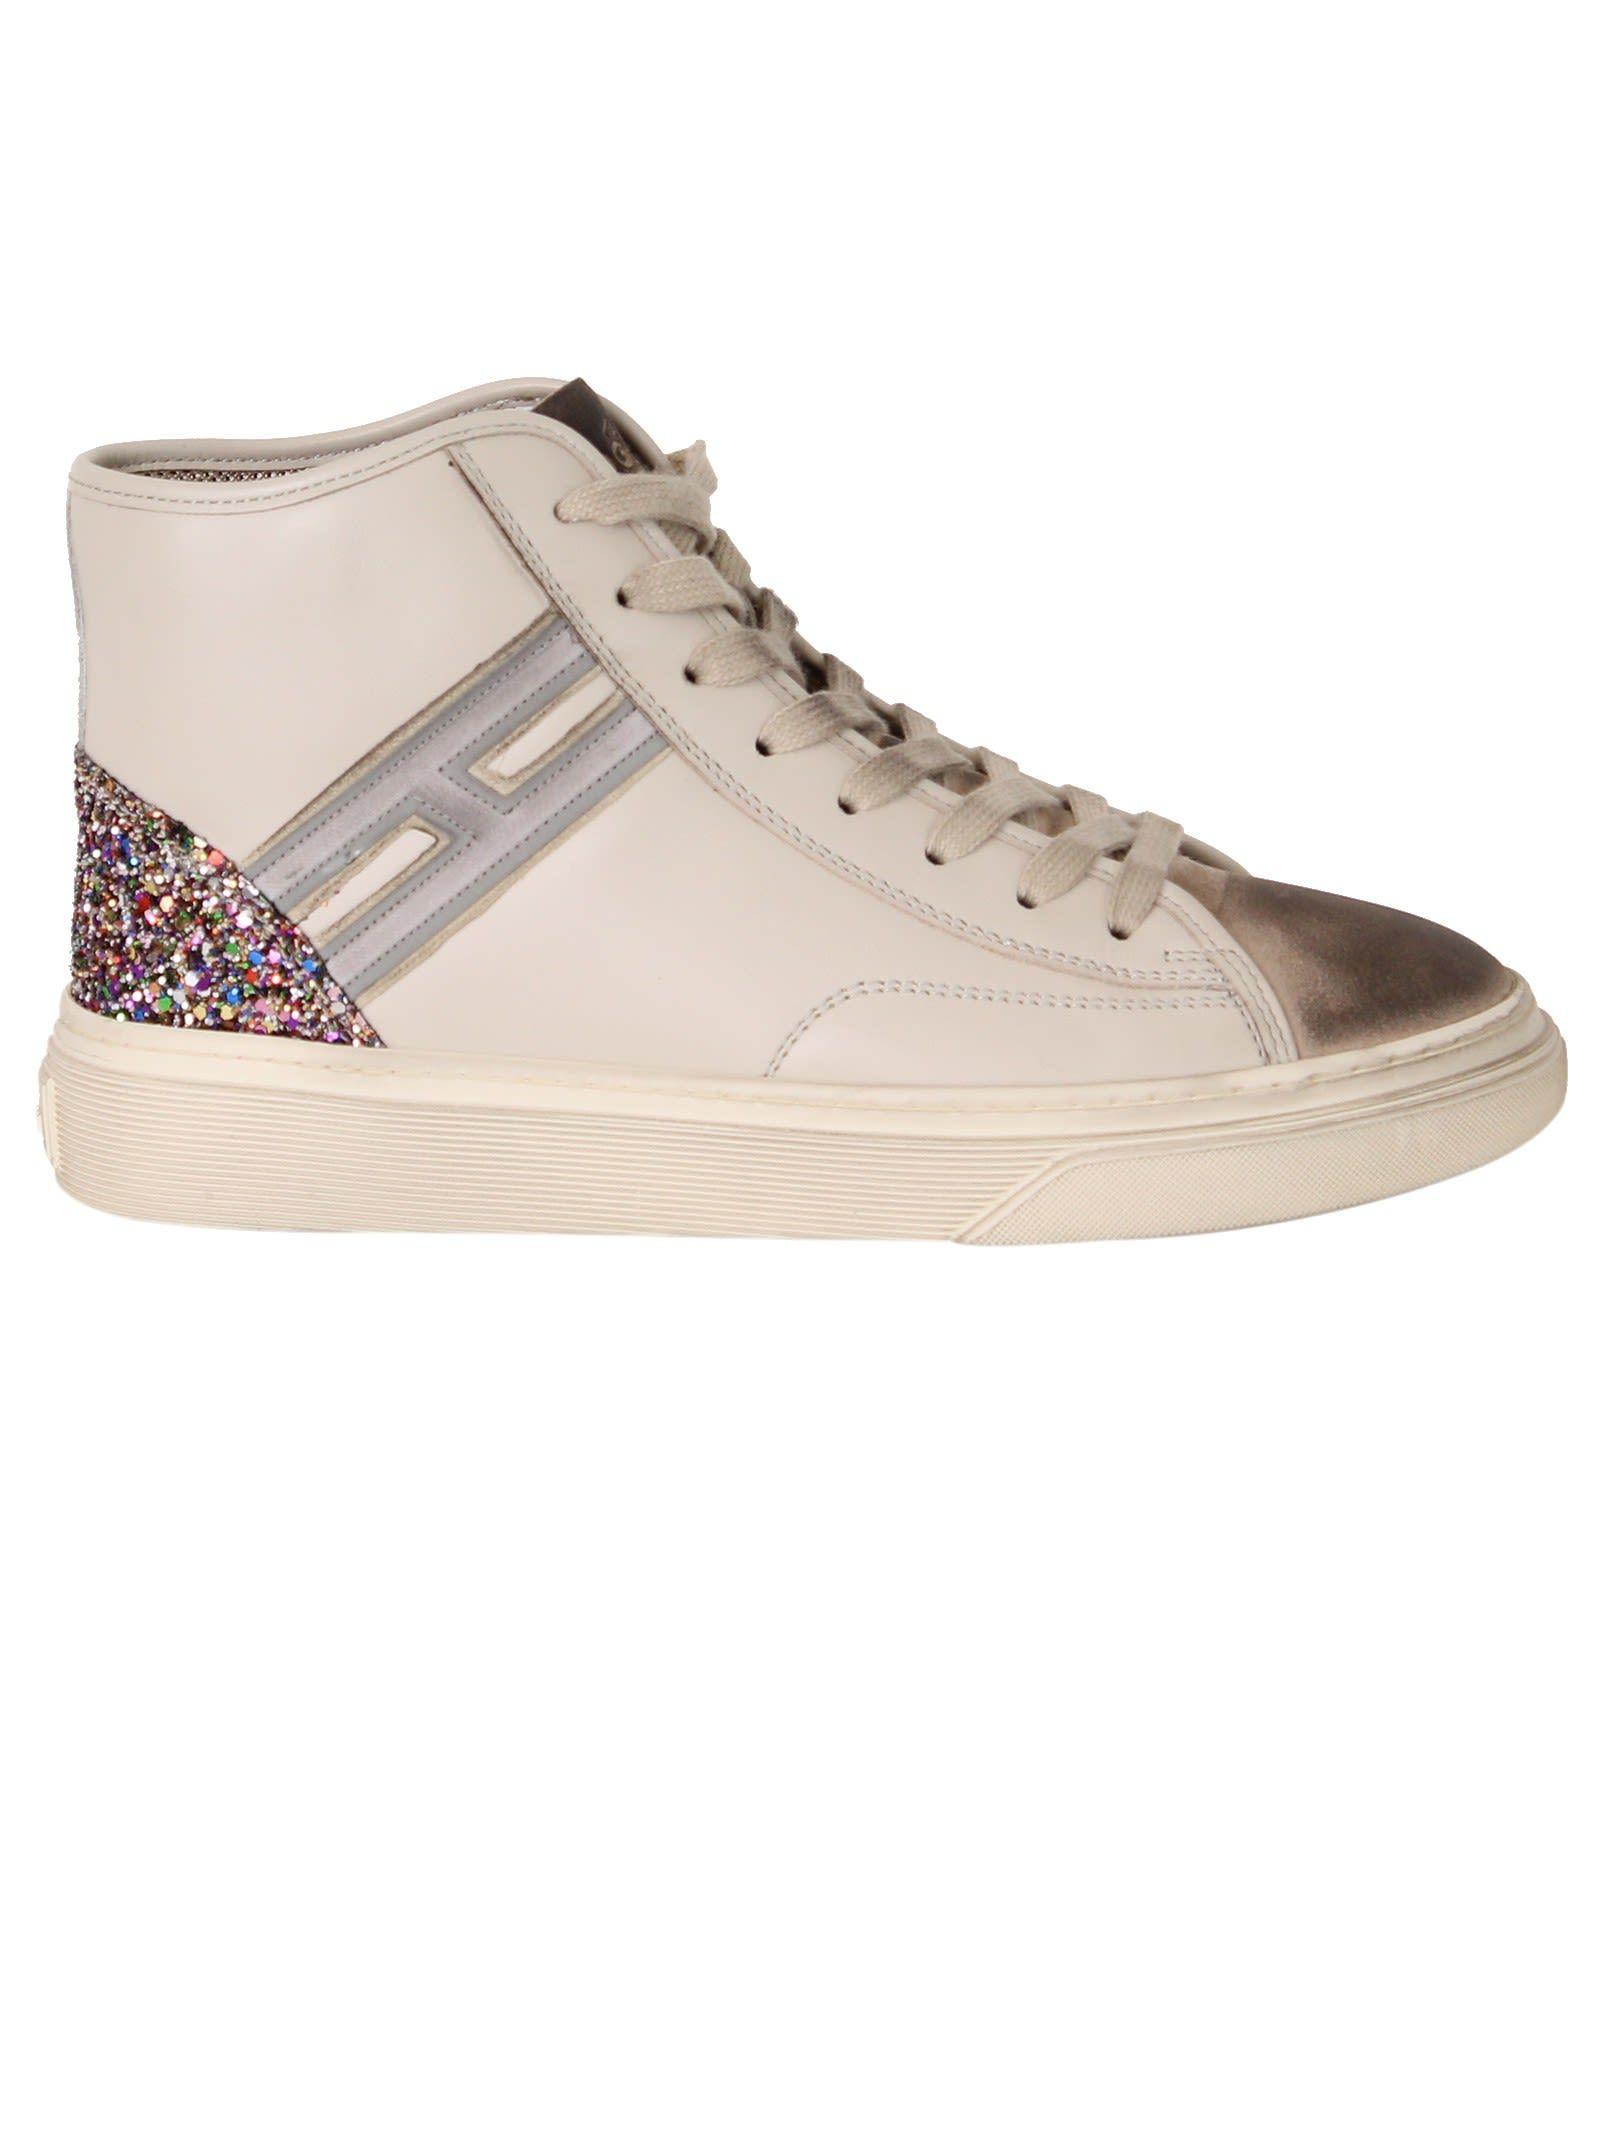 Cheap Really Hogan H342 Hi-top Sneakers Buy Cheap Store Buy Cheap Shop Offer jgFdjk